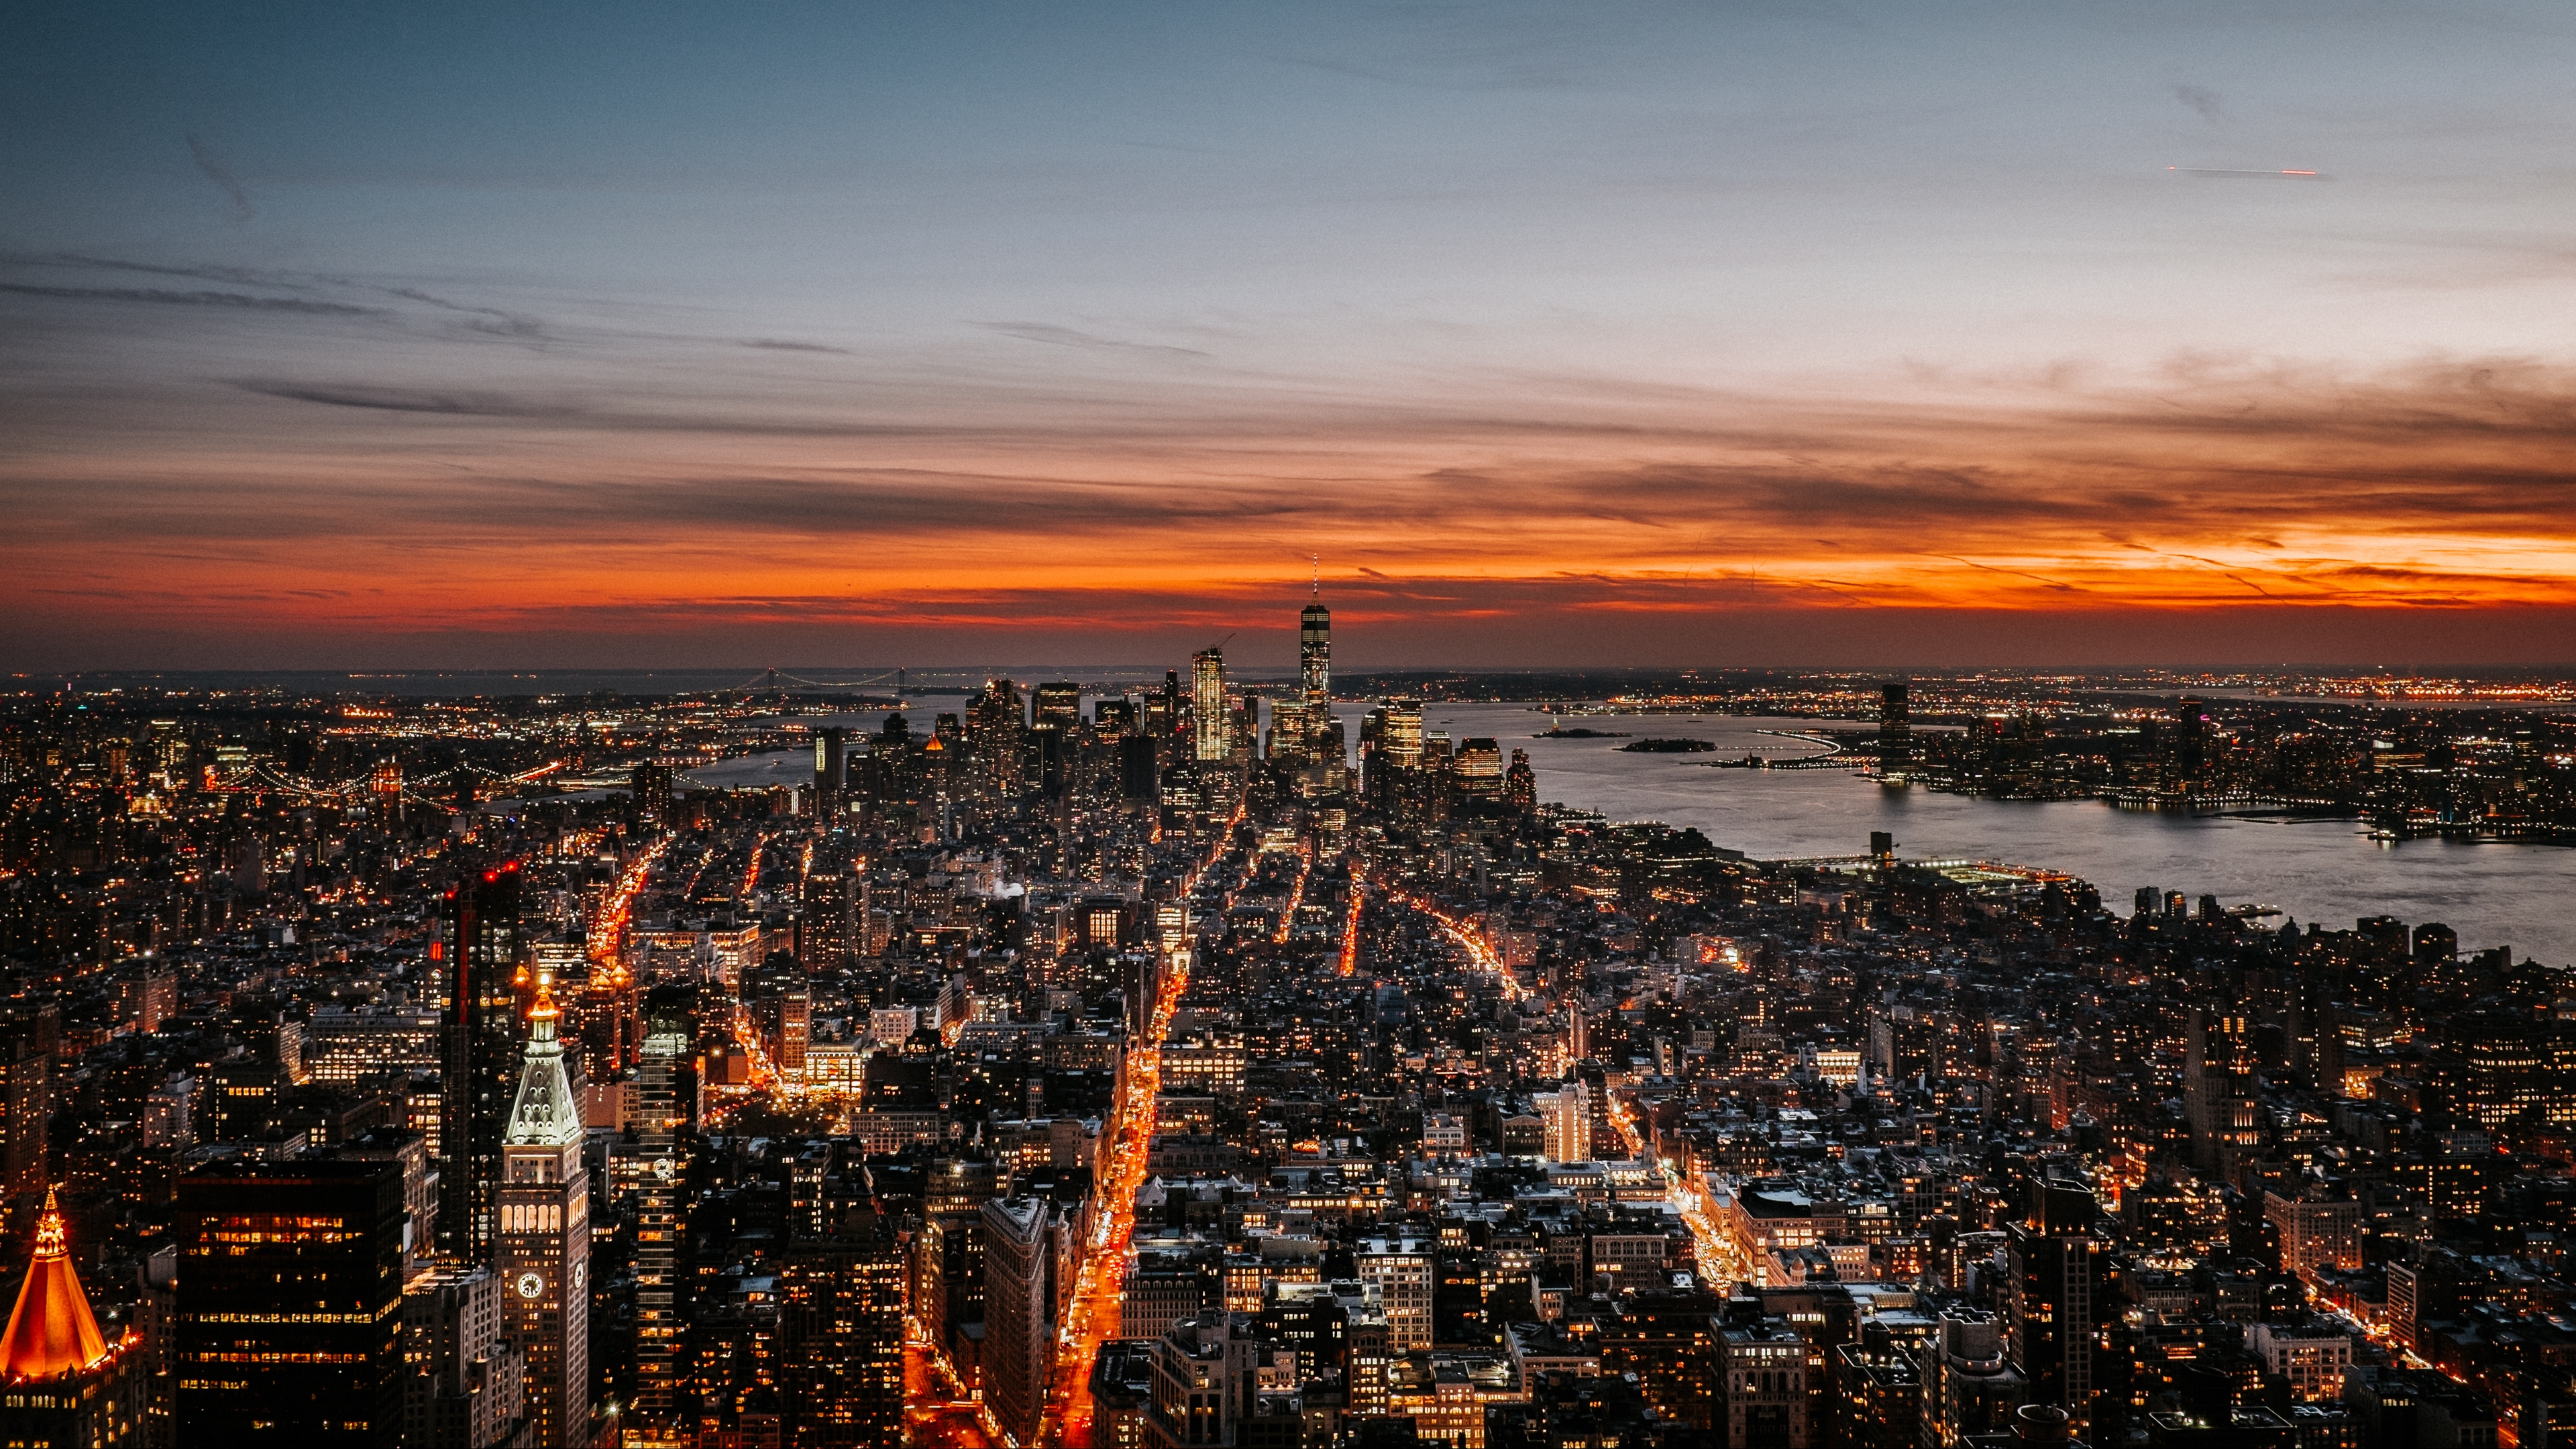 new york night city skyline sky dusk sunset 4k 1538065531 - new york, night city, skyline, sky, dusk, sunset 4k - Skyline, night city, new york